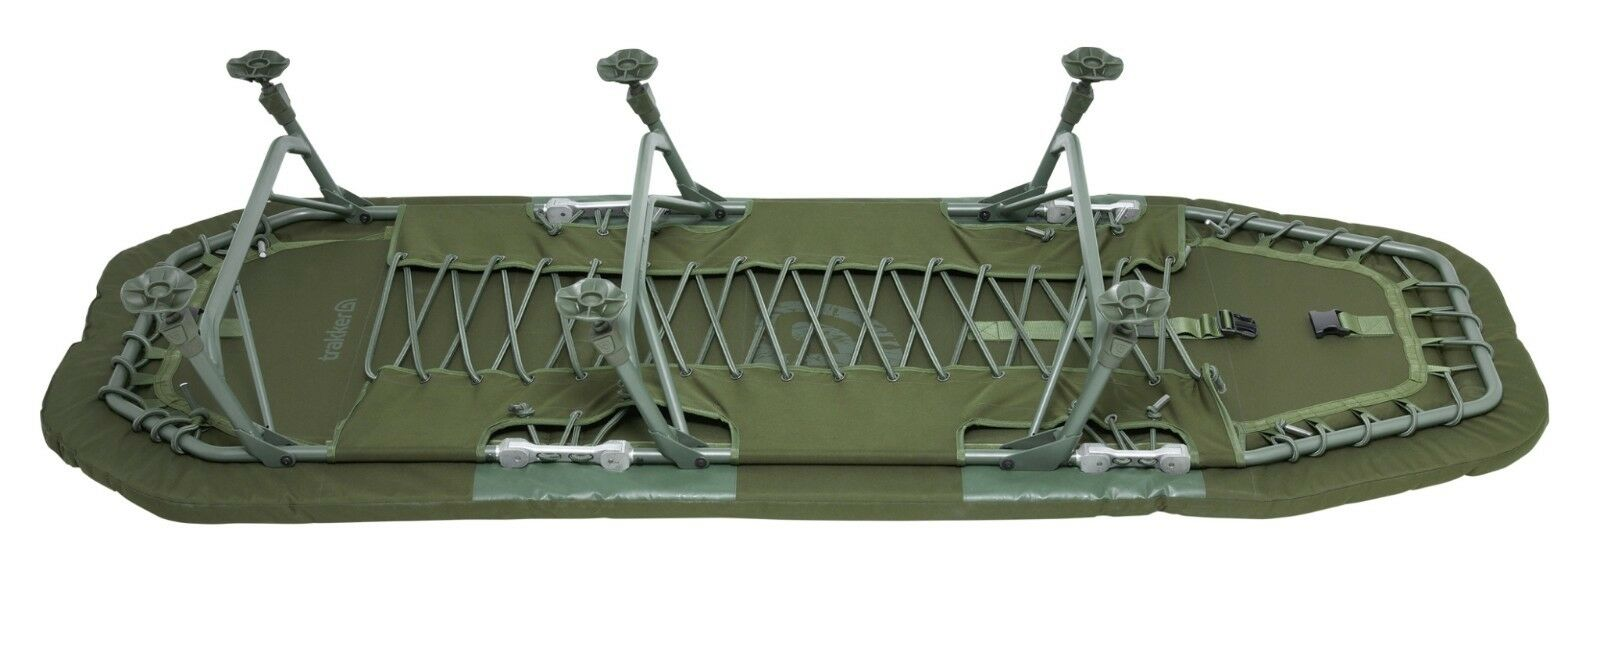 Trakker Levelite Lumbar Bed NEW Carp Fishing Bedchair Bedchair Fishing - 217118 5bbc4a